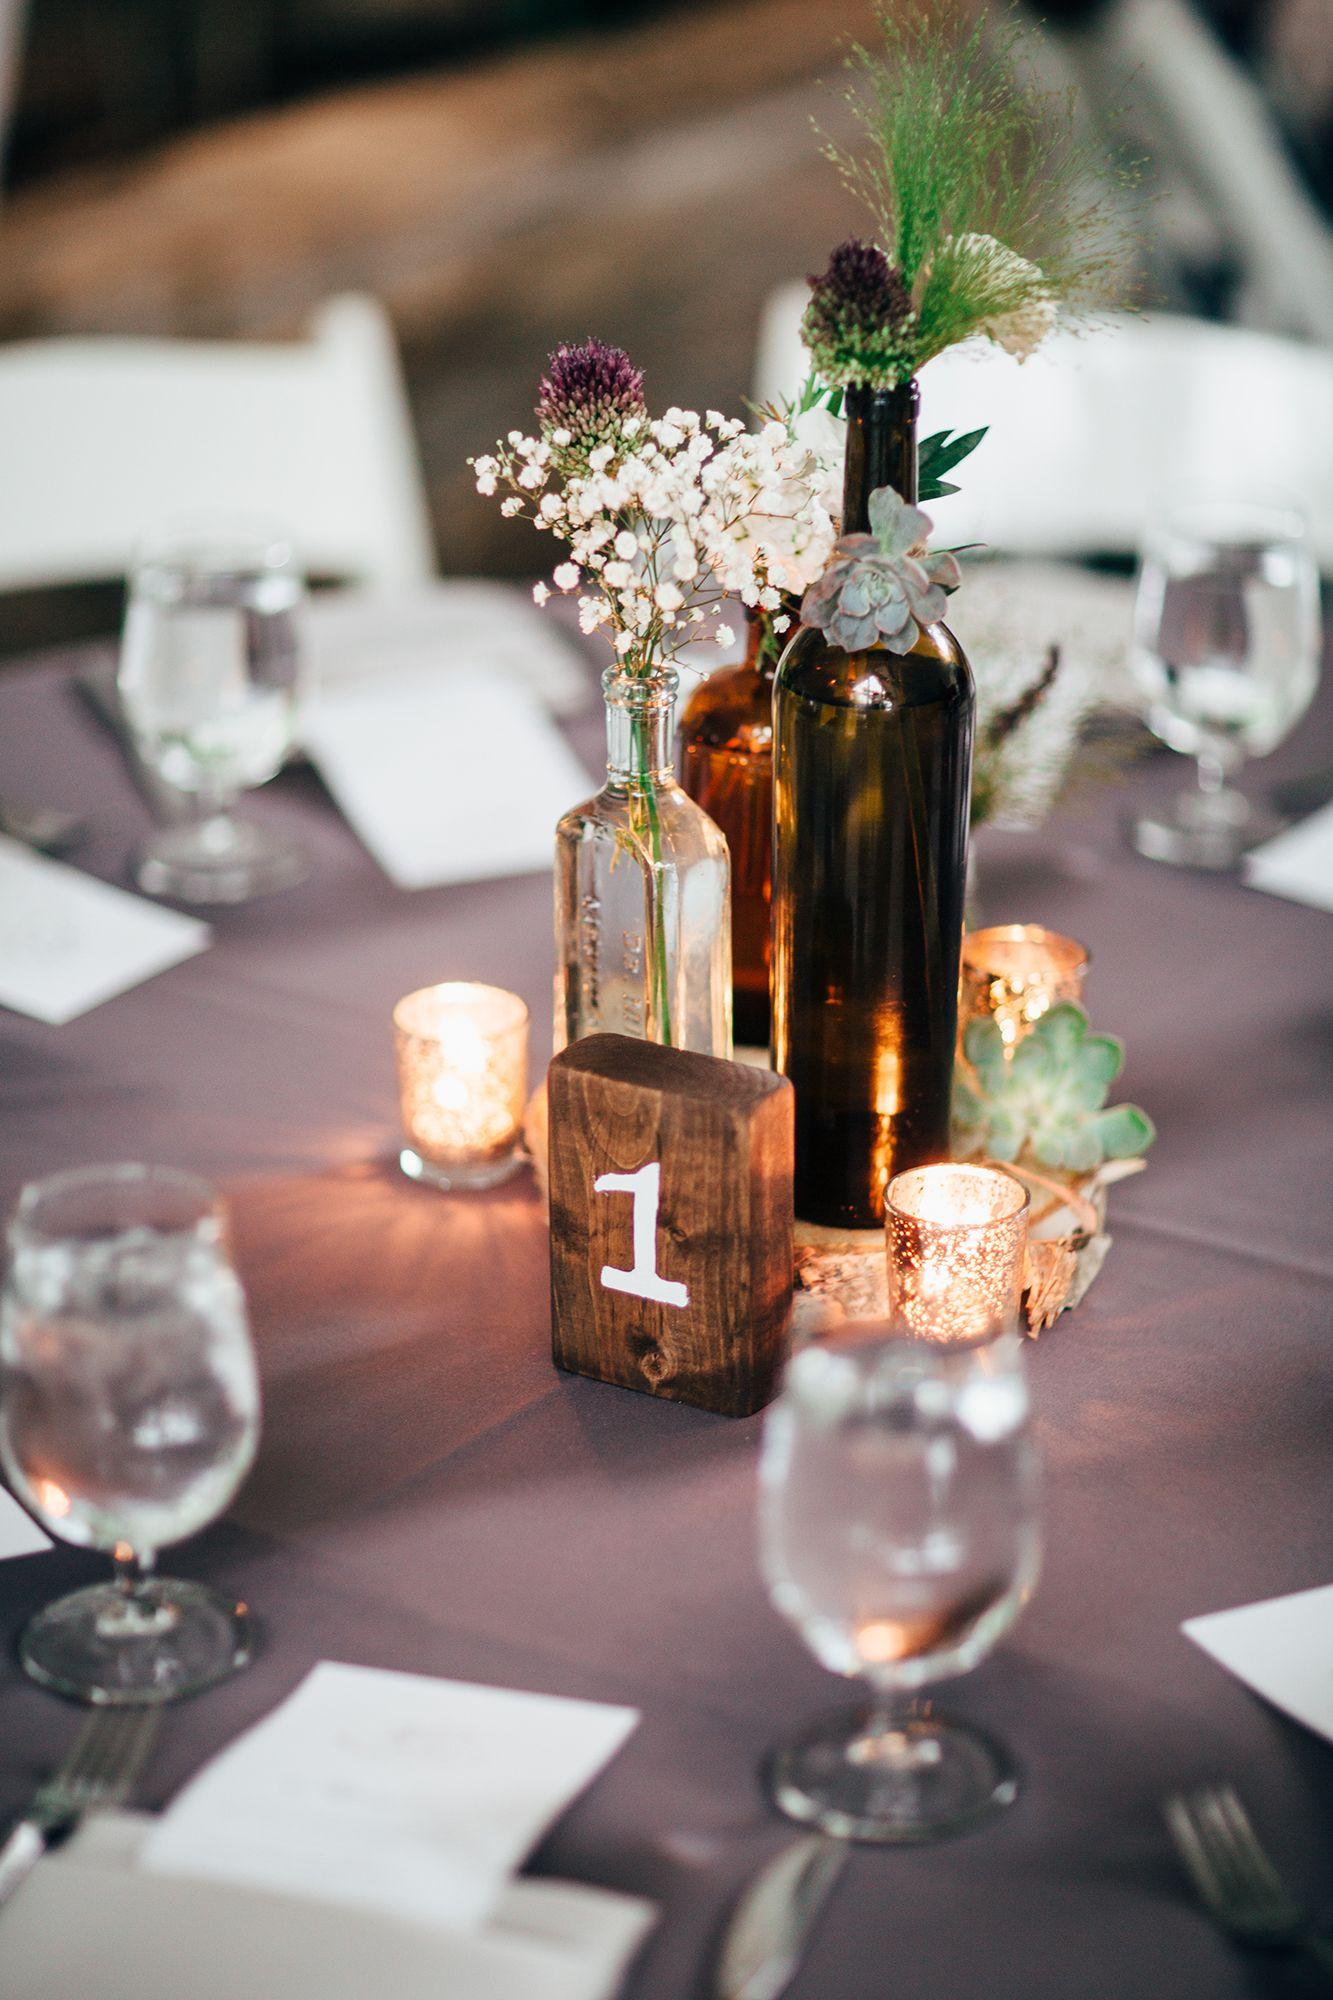 Natural Garden Party Wedding Wine Bottle Wedding Centerpieces Wine Bottle Centerpieces Wedding Wine Bottles